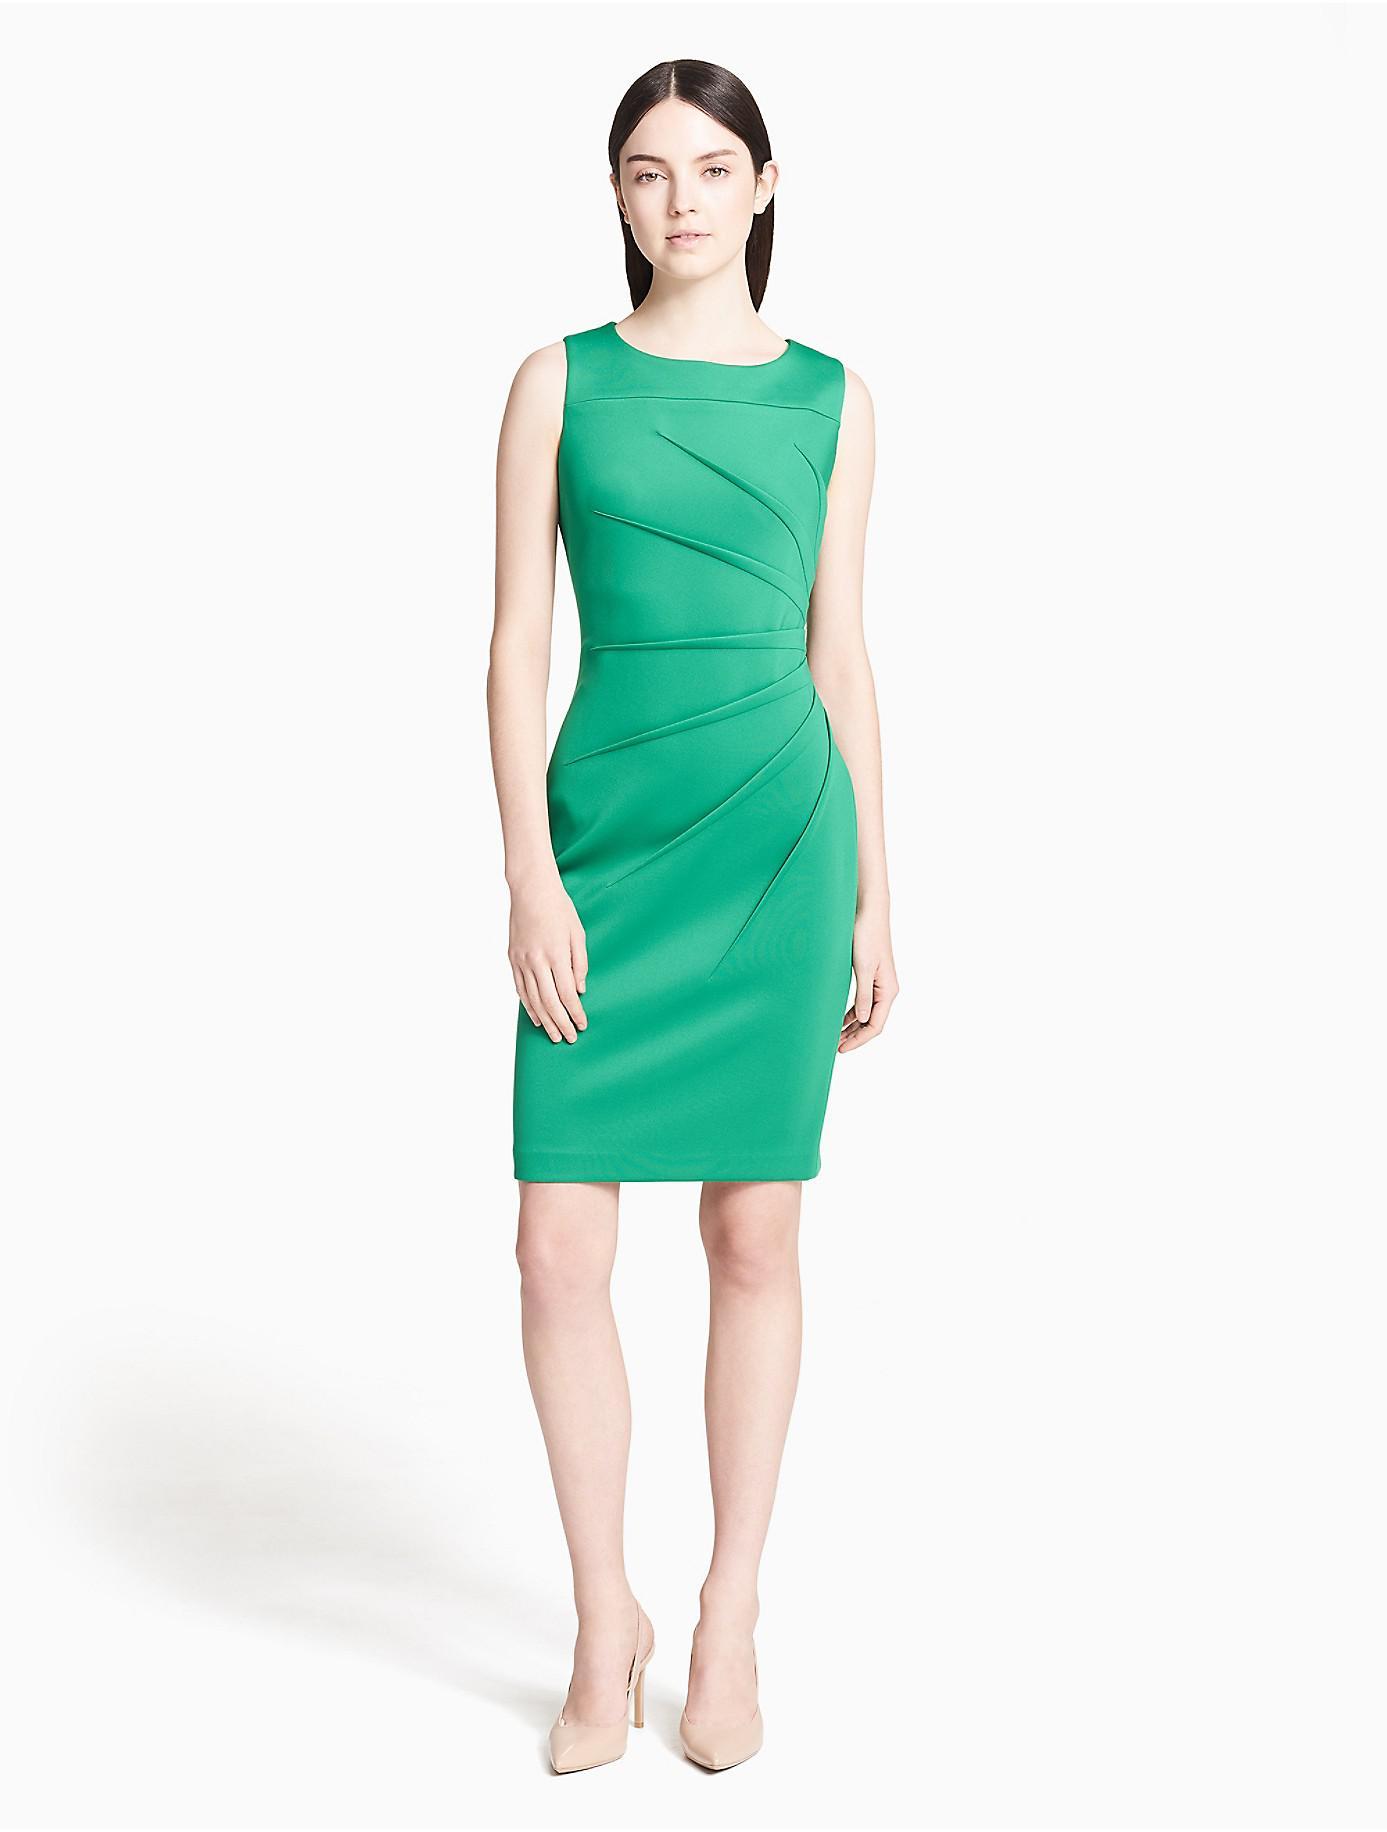 Lyst - Calvin Klein 205W39Nyc Scuba Starburst Sheath Dress in Green